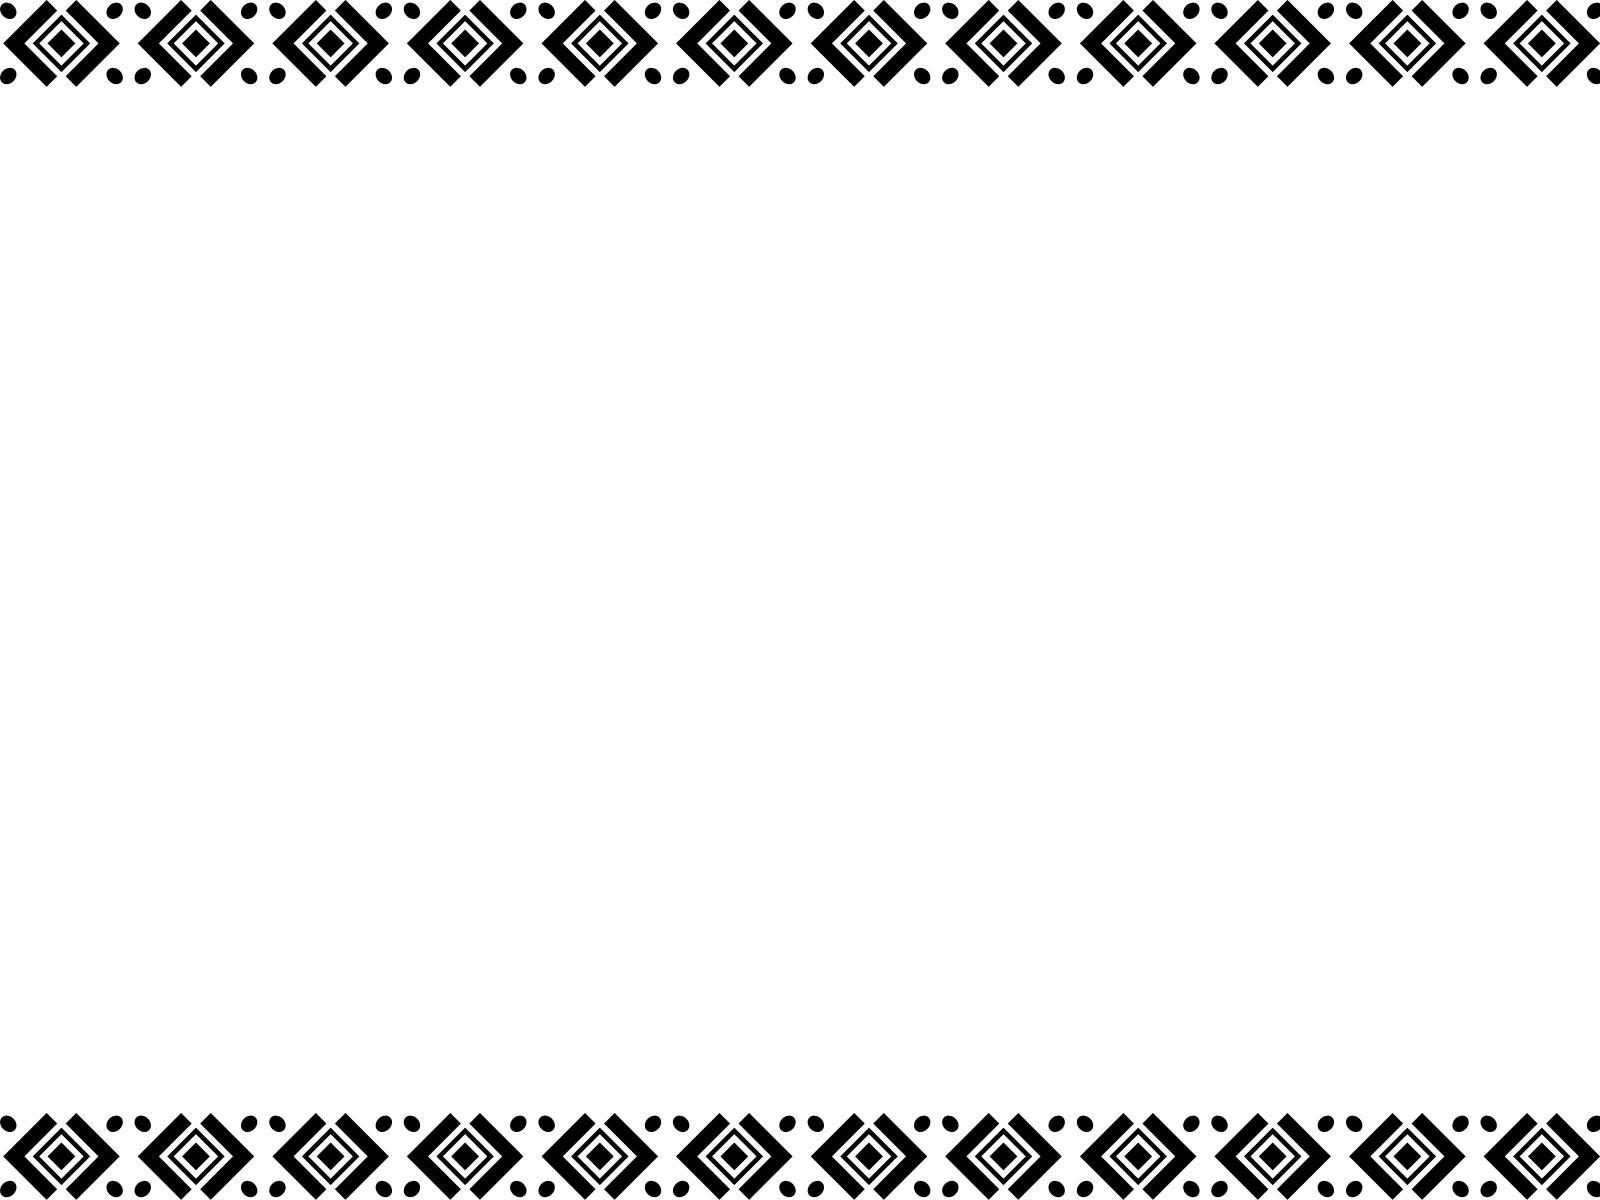 Simple white pattern wallpaper